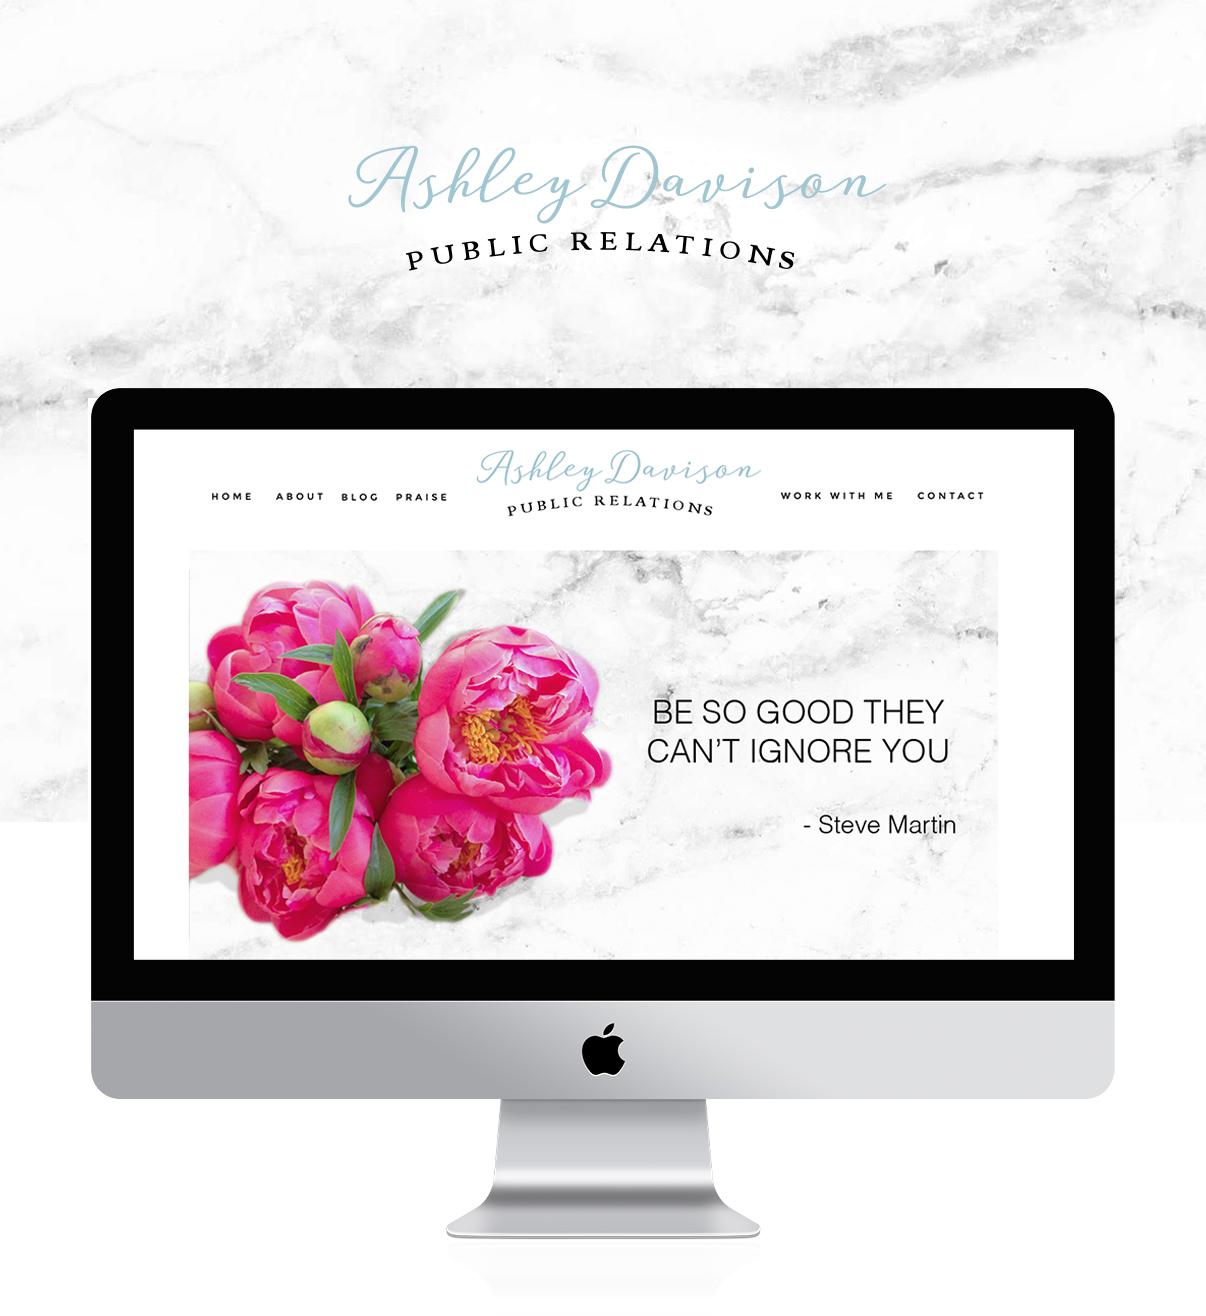 Ashley Davison - DESIGN - Social Share.jpg